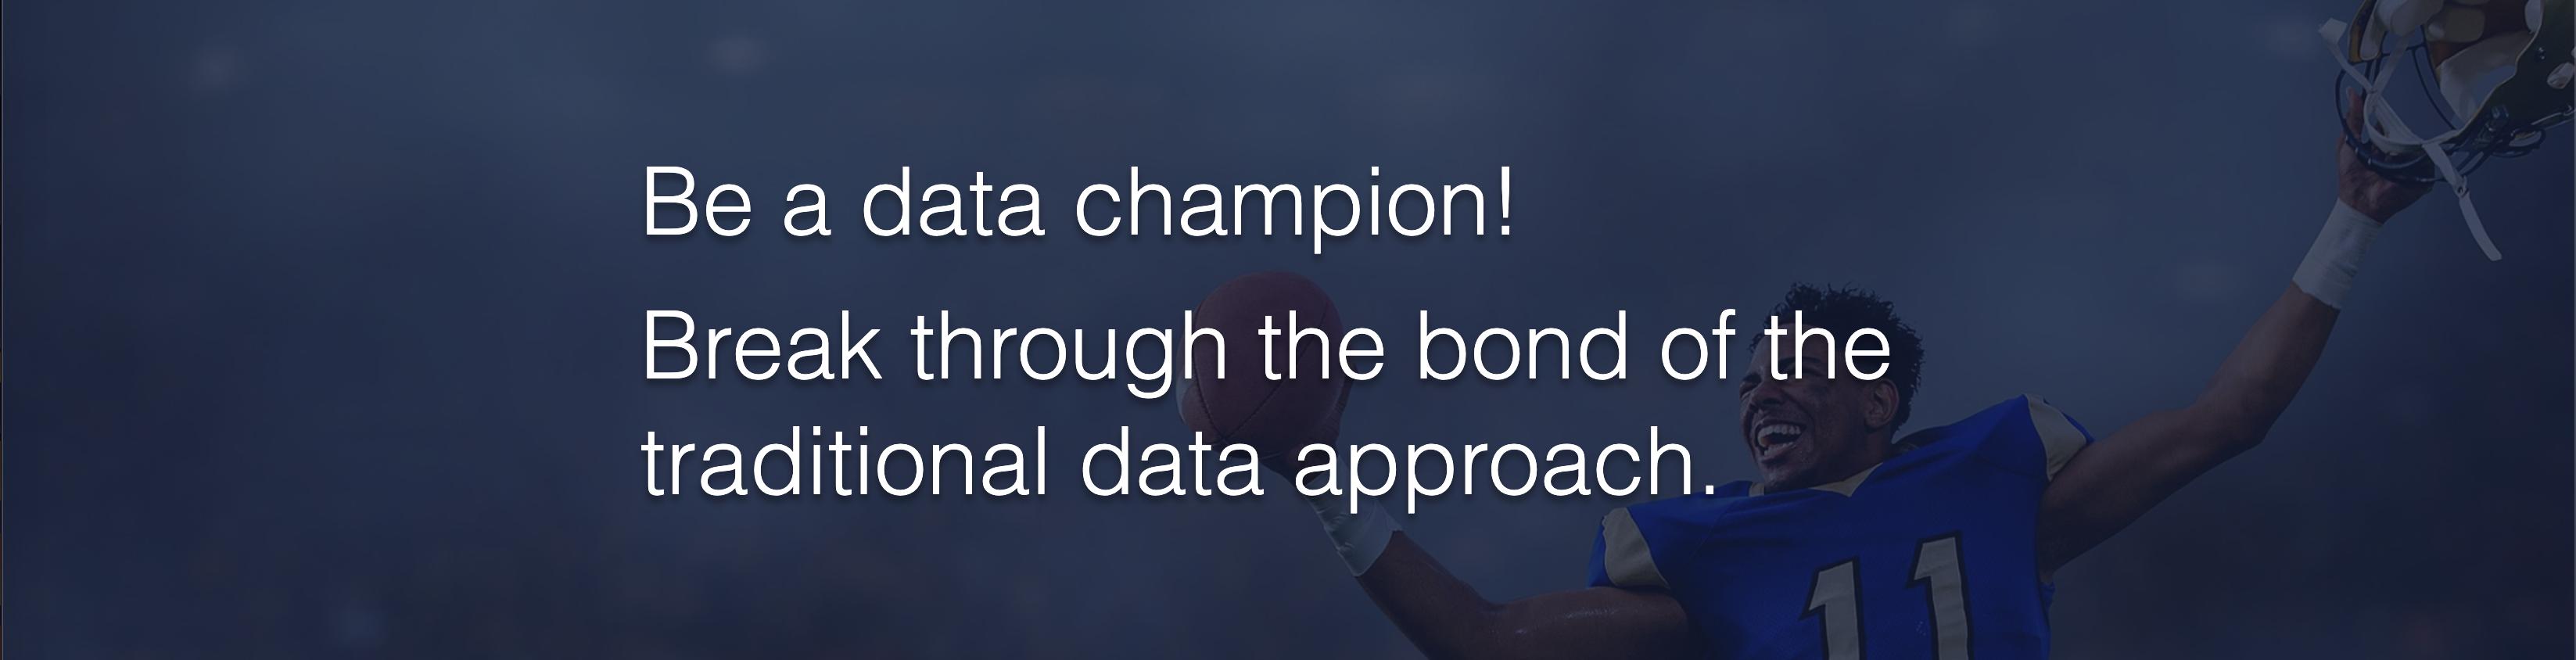 Be a data champion